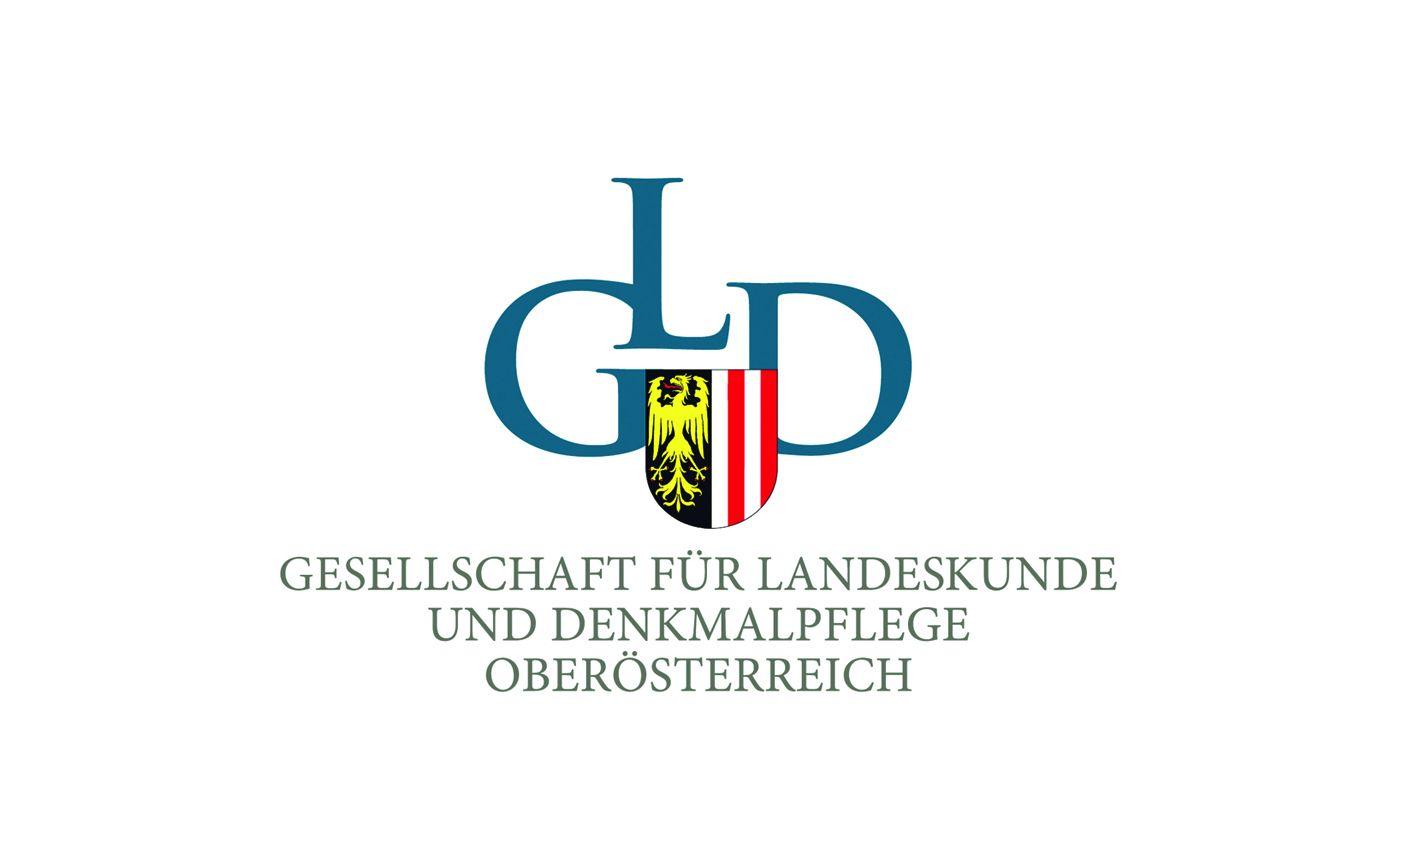 GLD_logo rand homepage